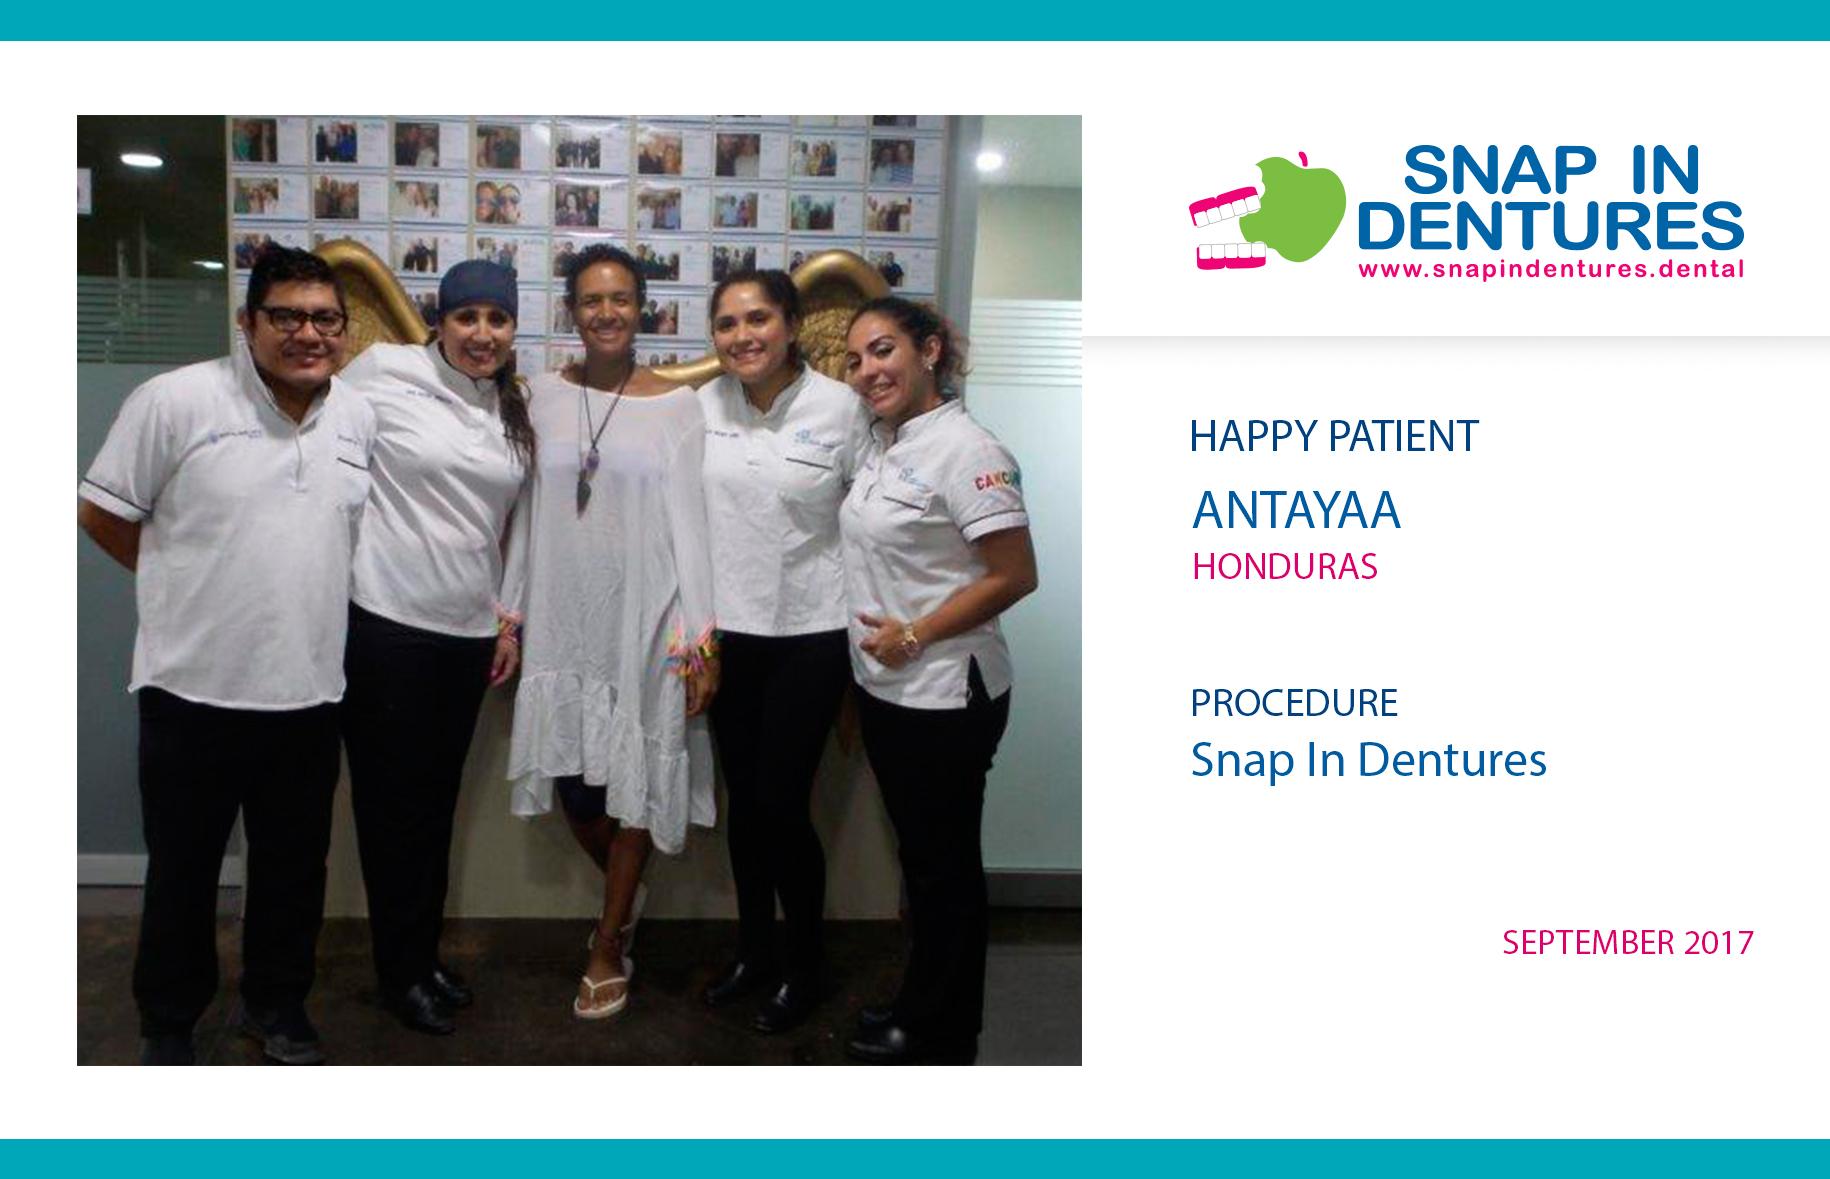 Snap in dentures reviews: Anataya smile again!